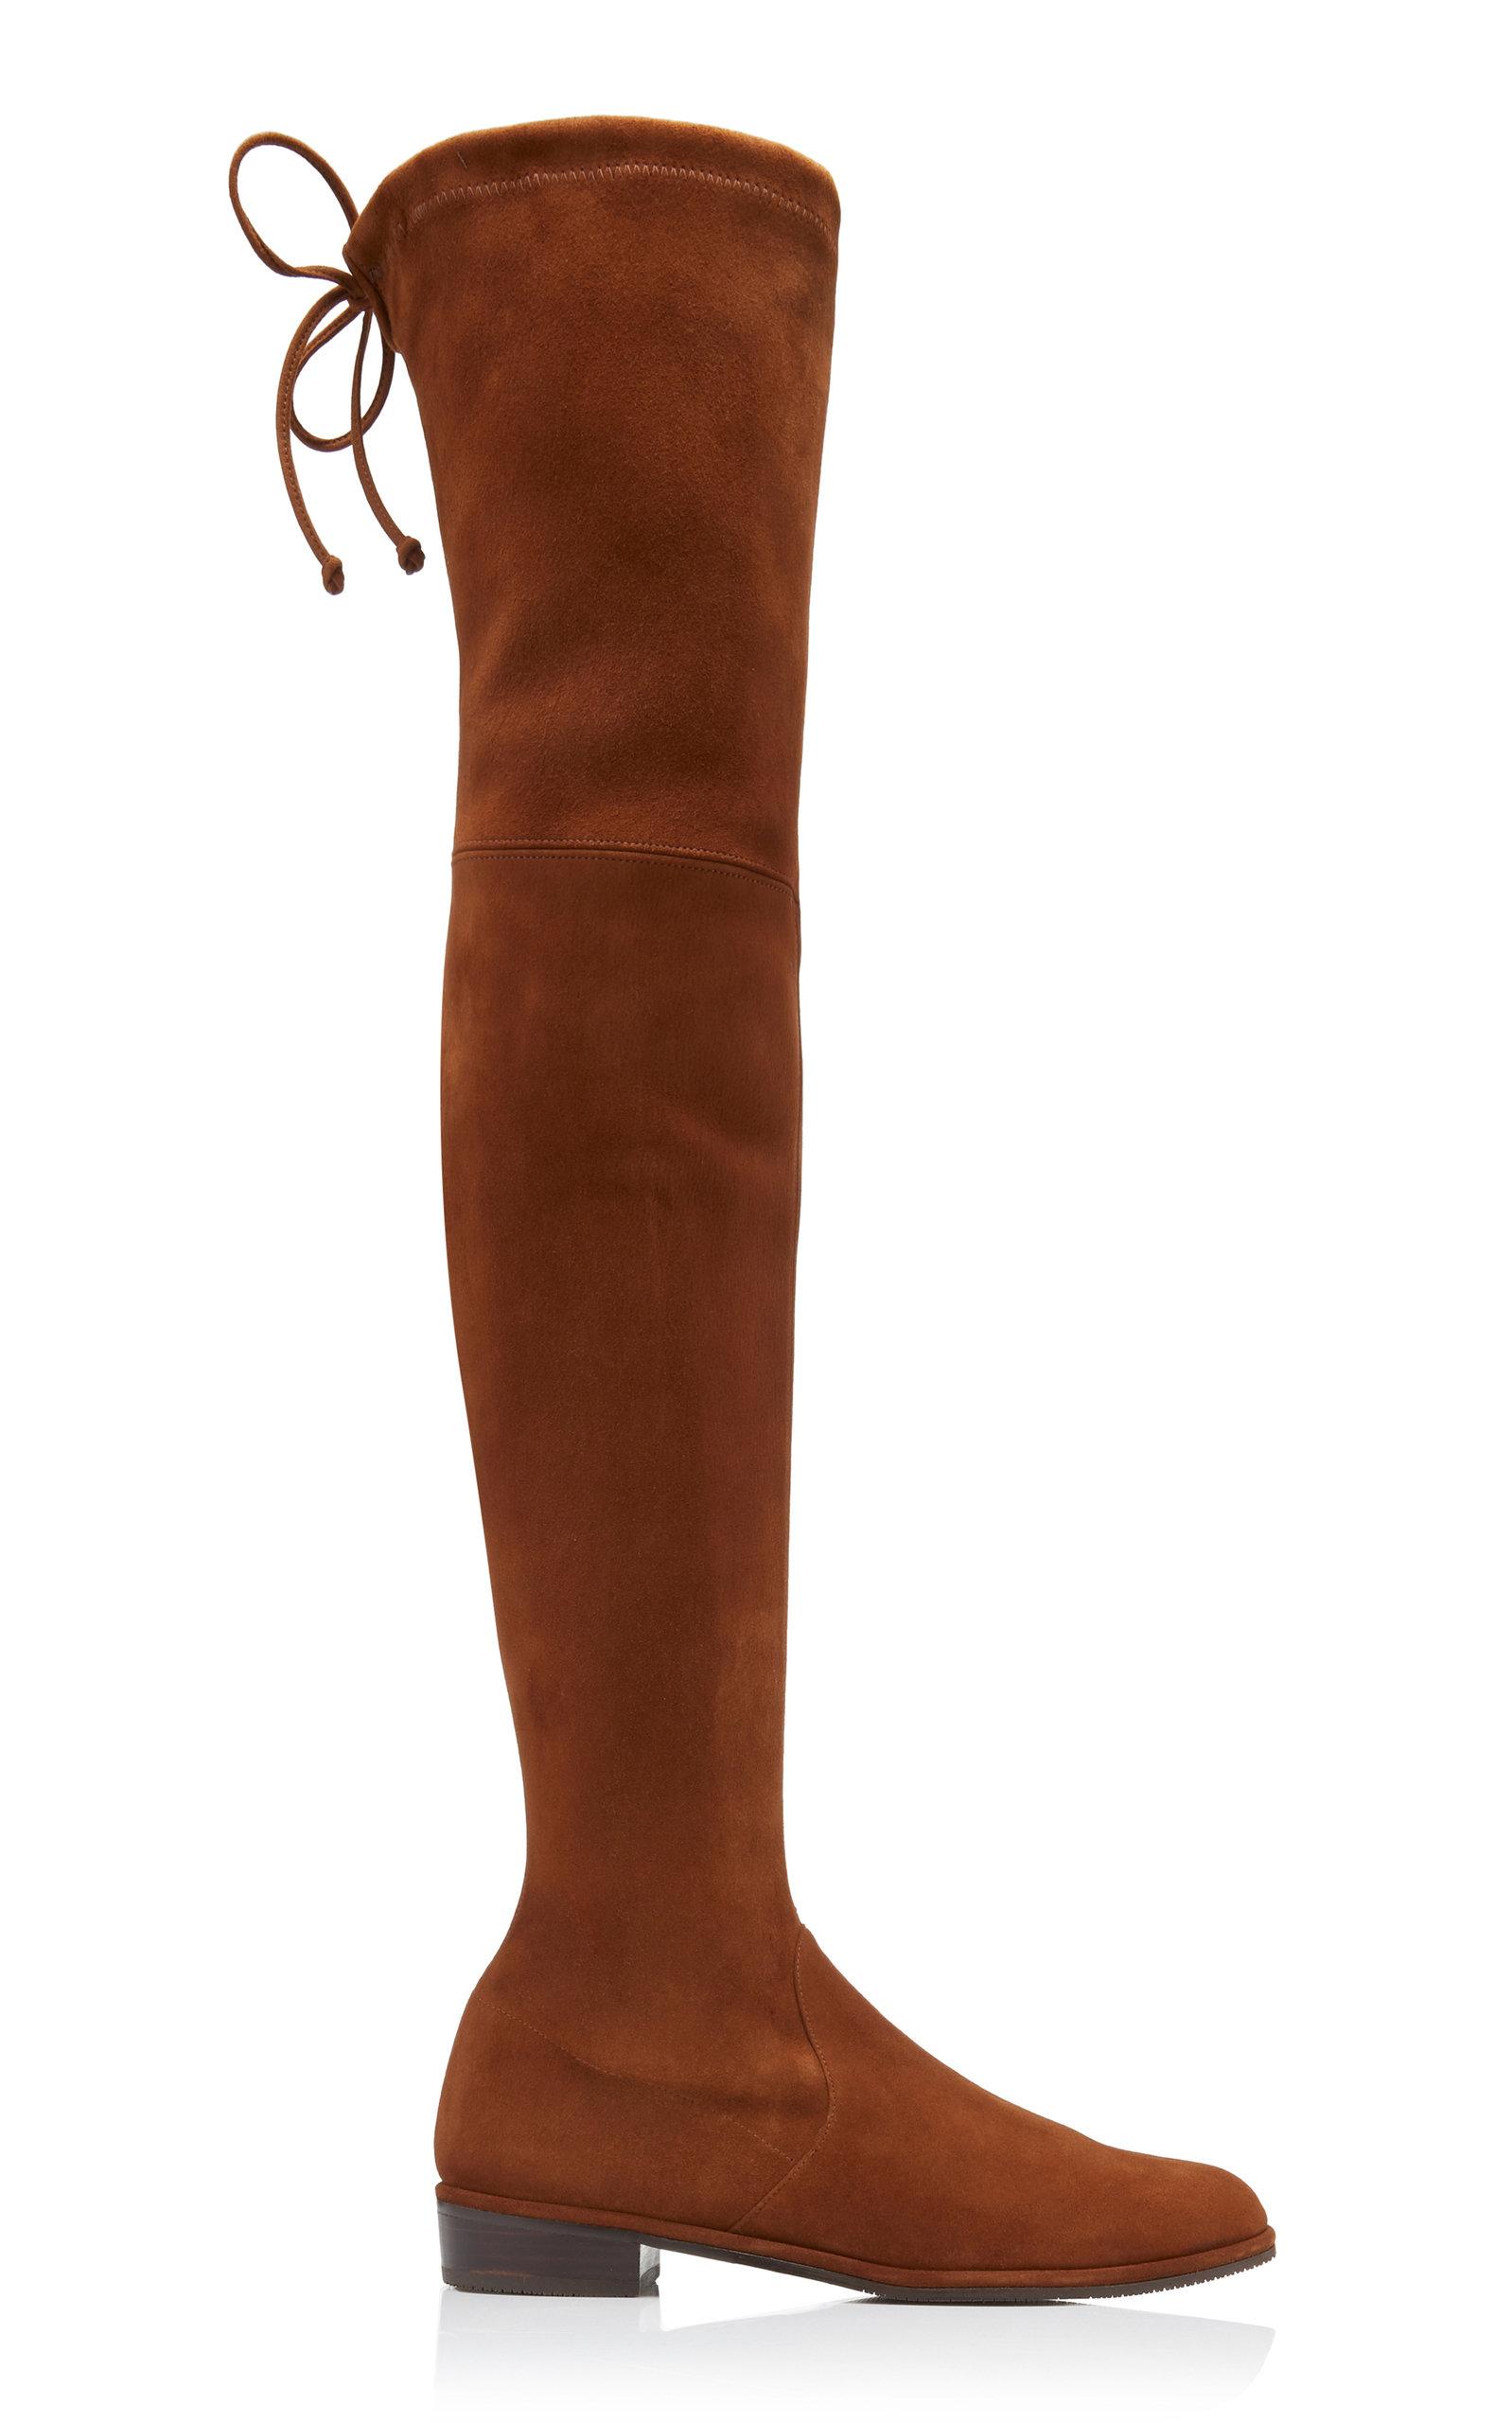 Stuart Weitzman Boots Lowland Over-The-Knee Suede Boots